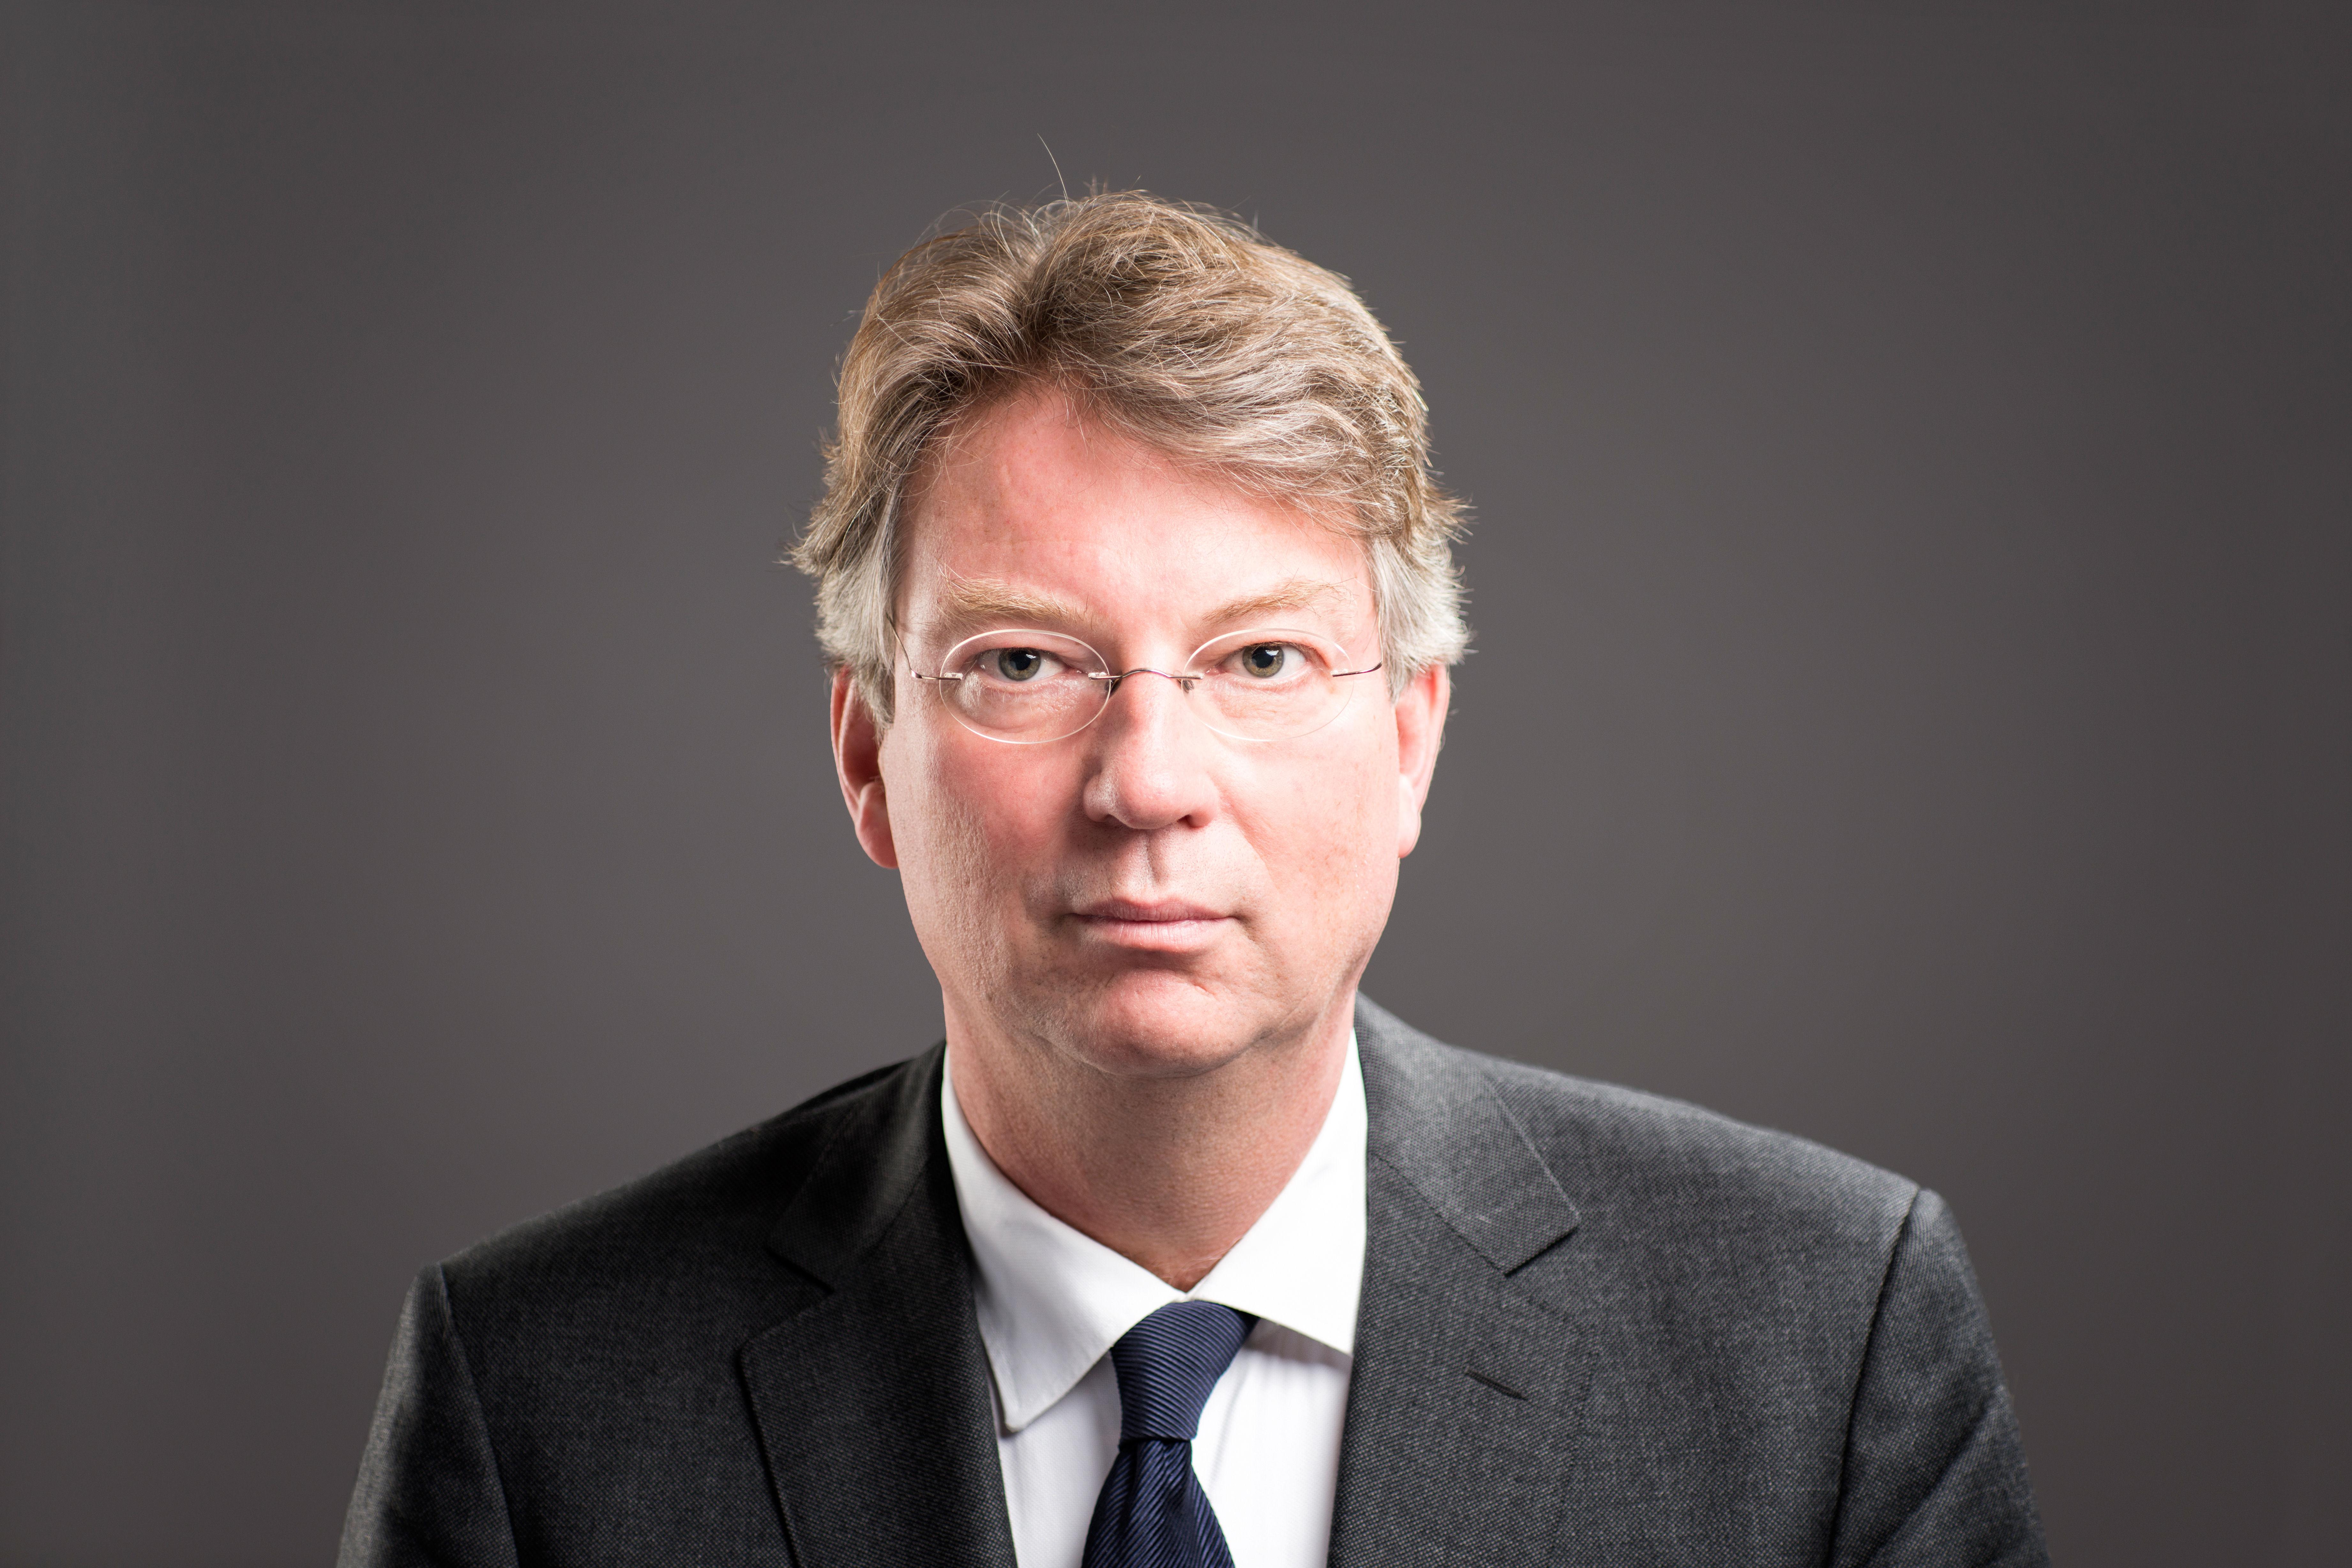 Arend Jan Boekestijn - Landscape - HR